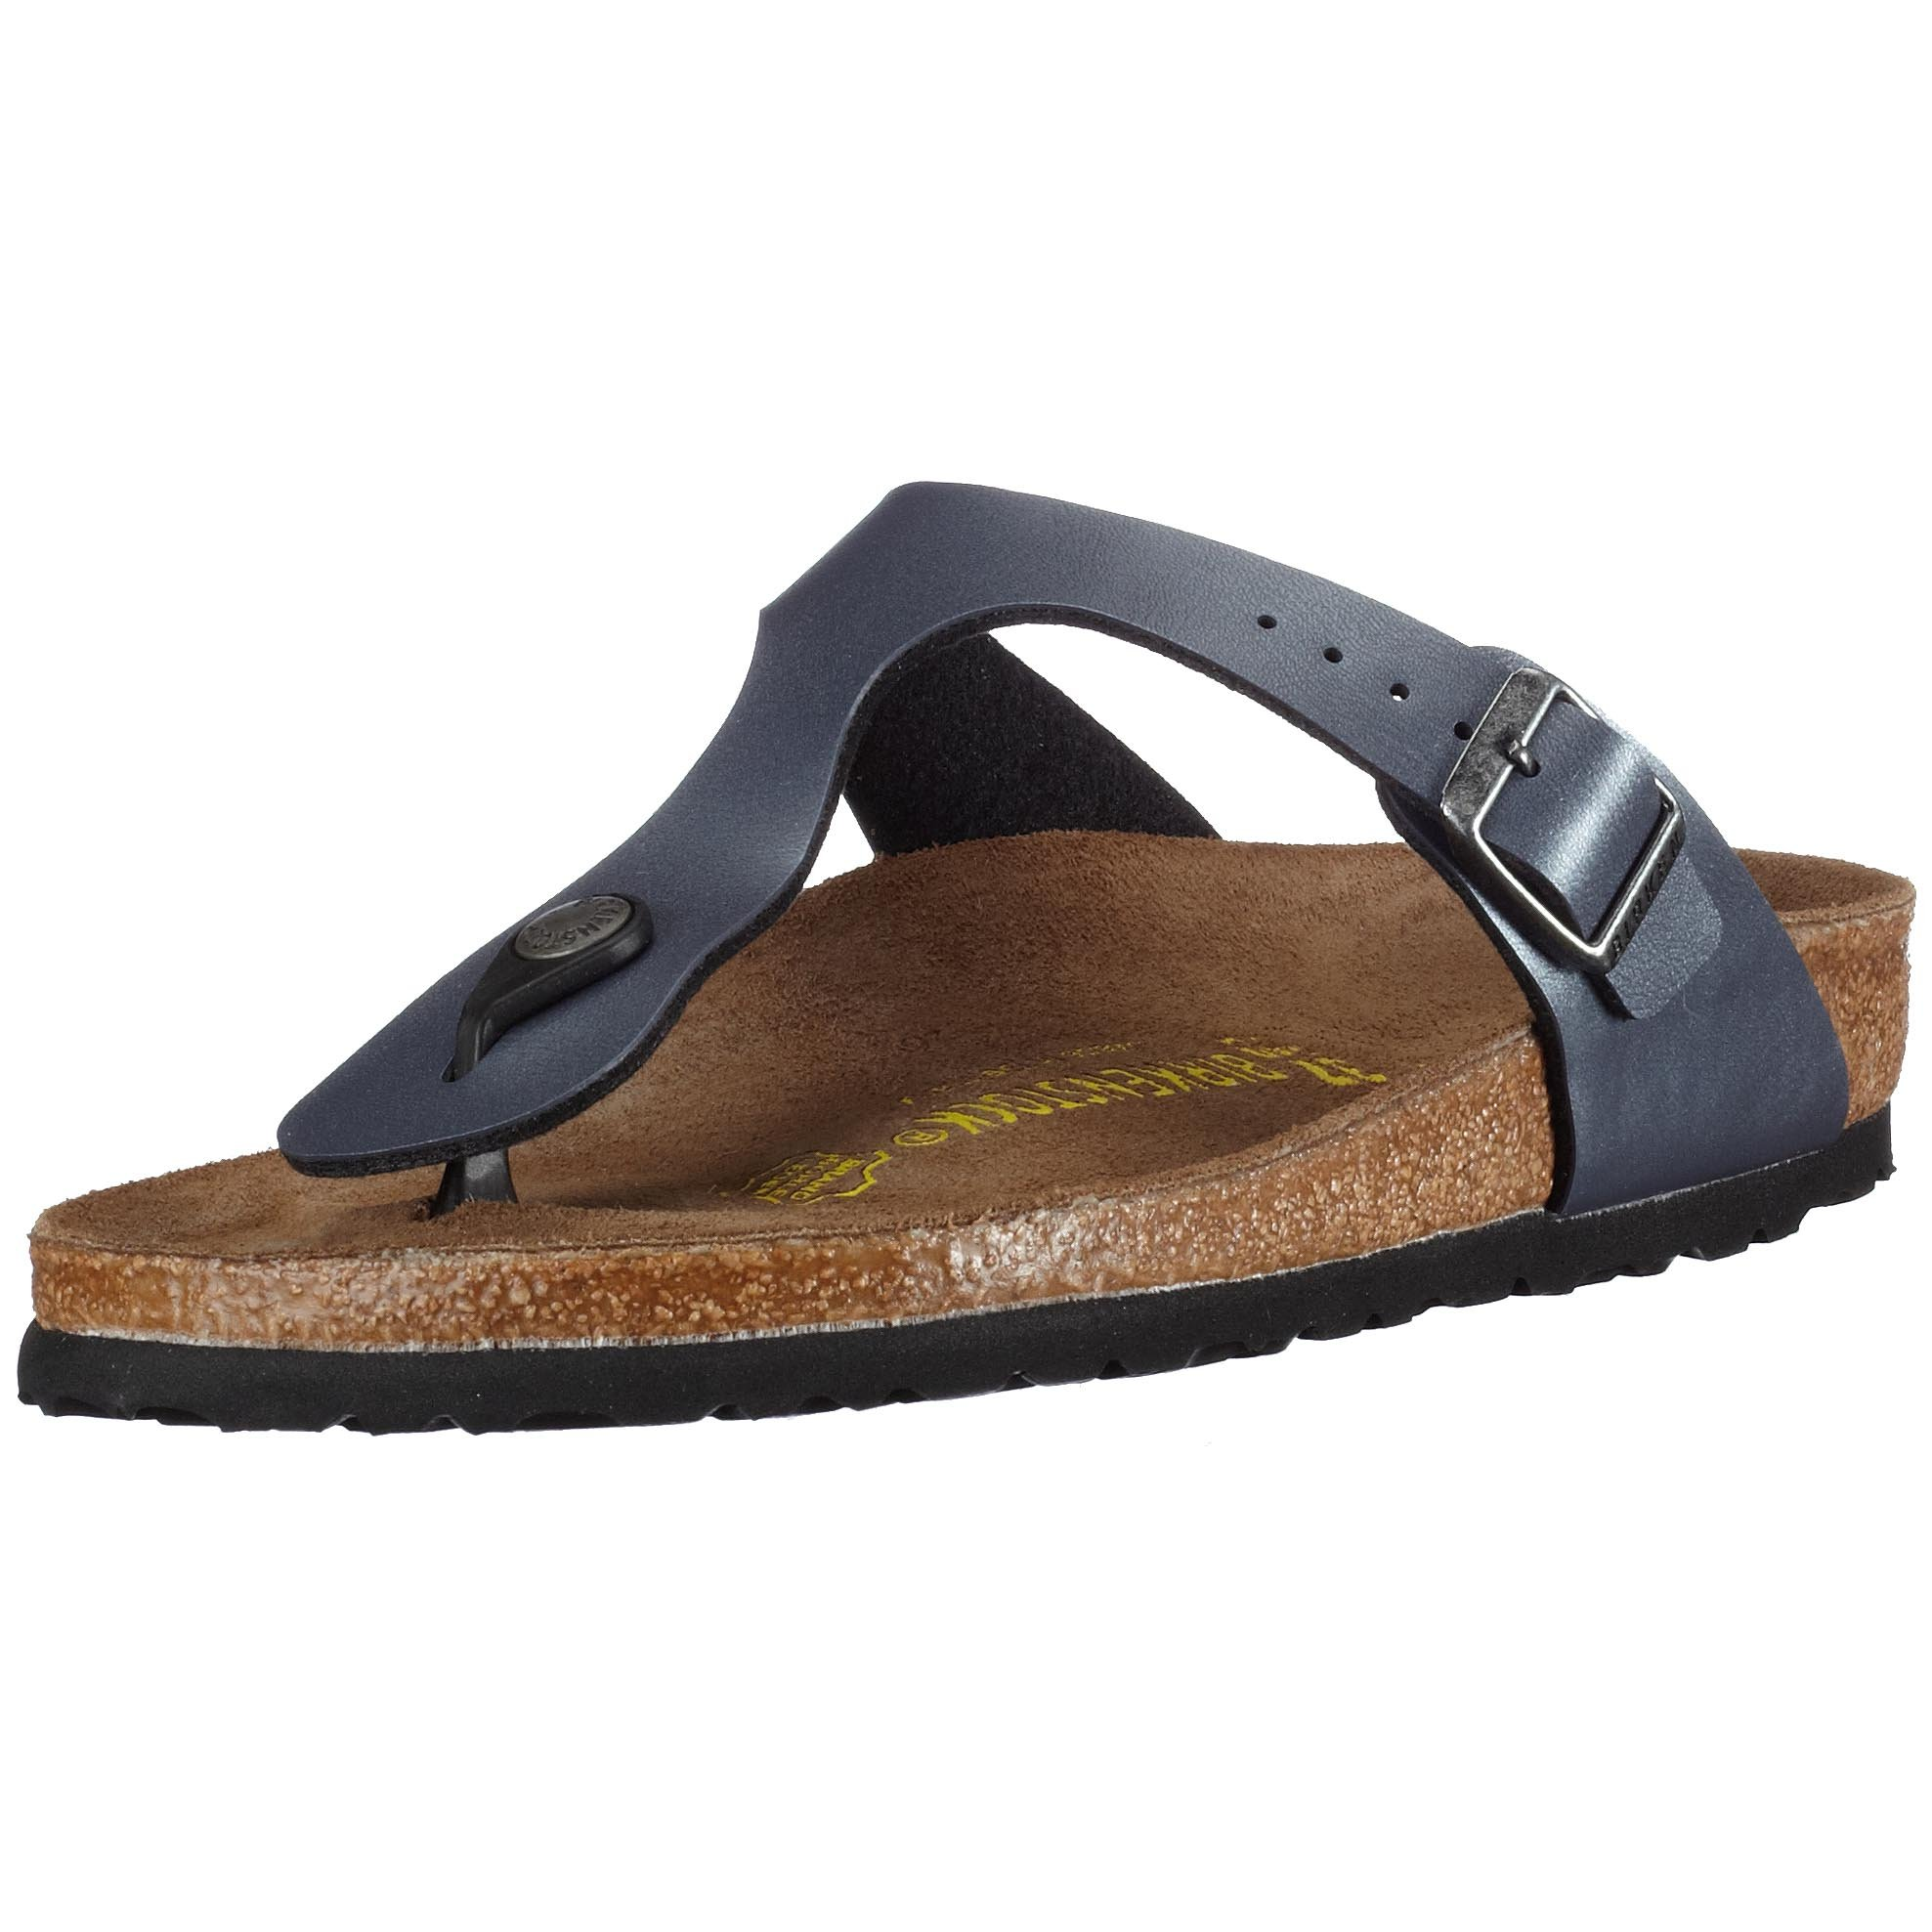 Birkenstock Women's Gizeh Cork Footbed Thong Sandal Onyx 41 M EU